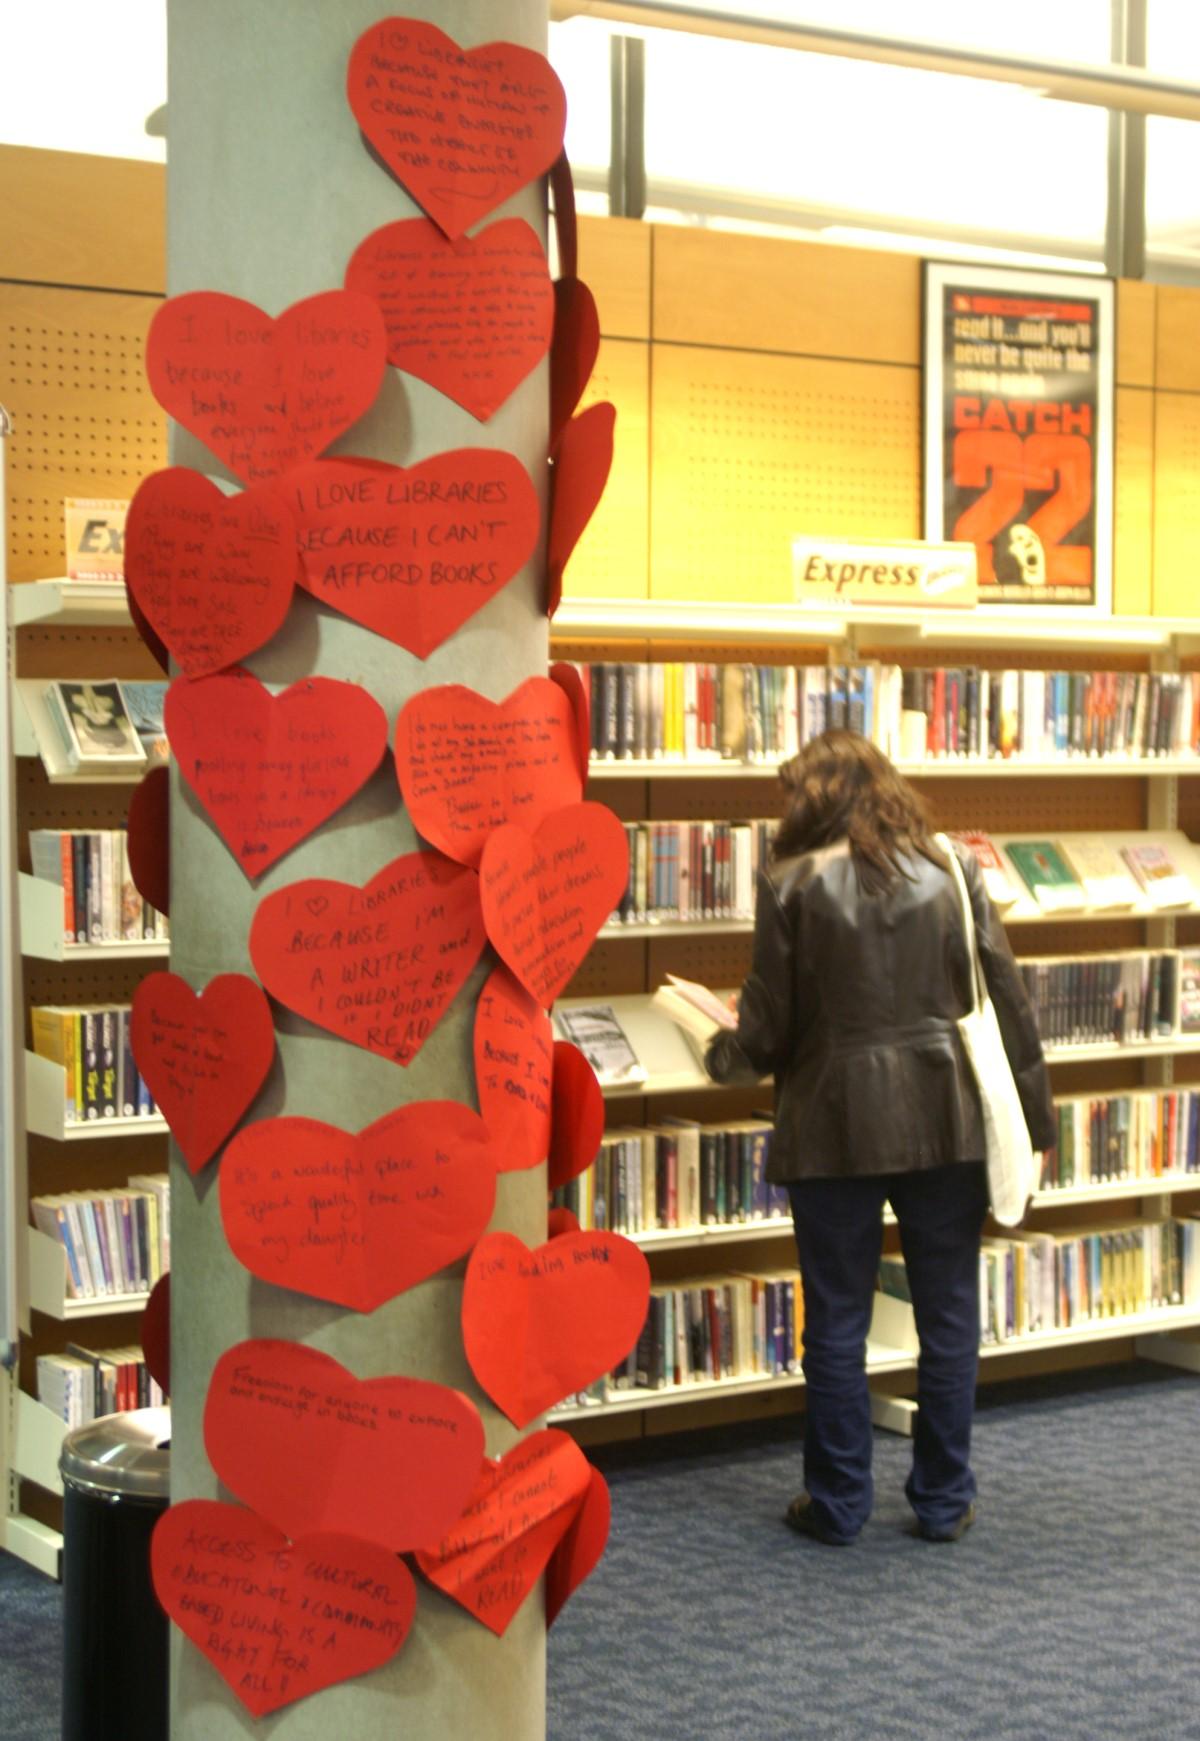 Cv Services Norwich Professional Cv Writing Service Cv Master Careers Norfolk Council Library Cuts Kj Katy Jon Went